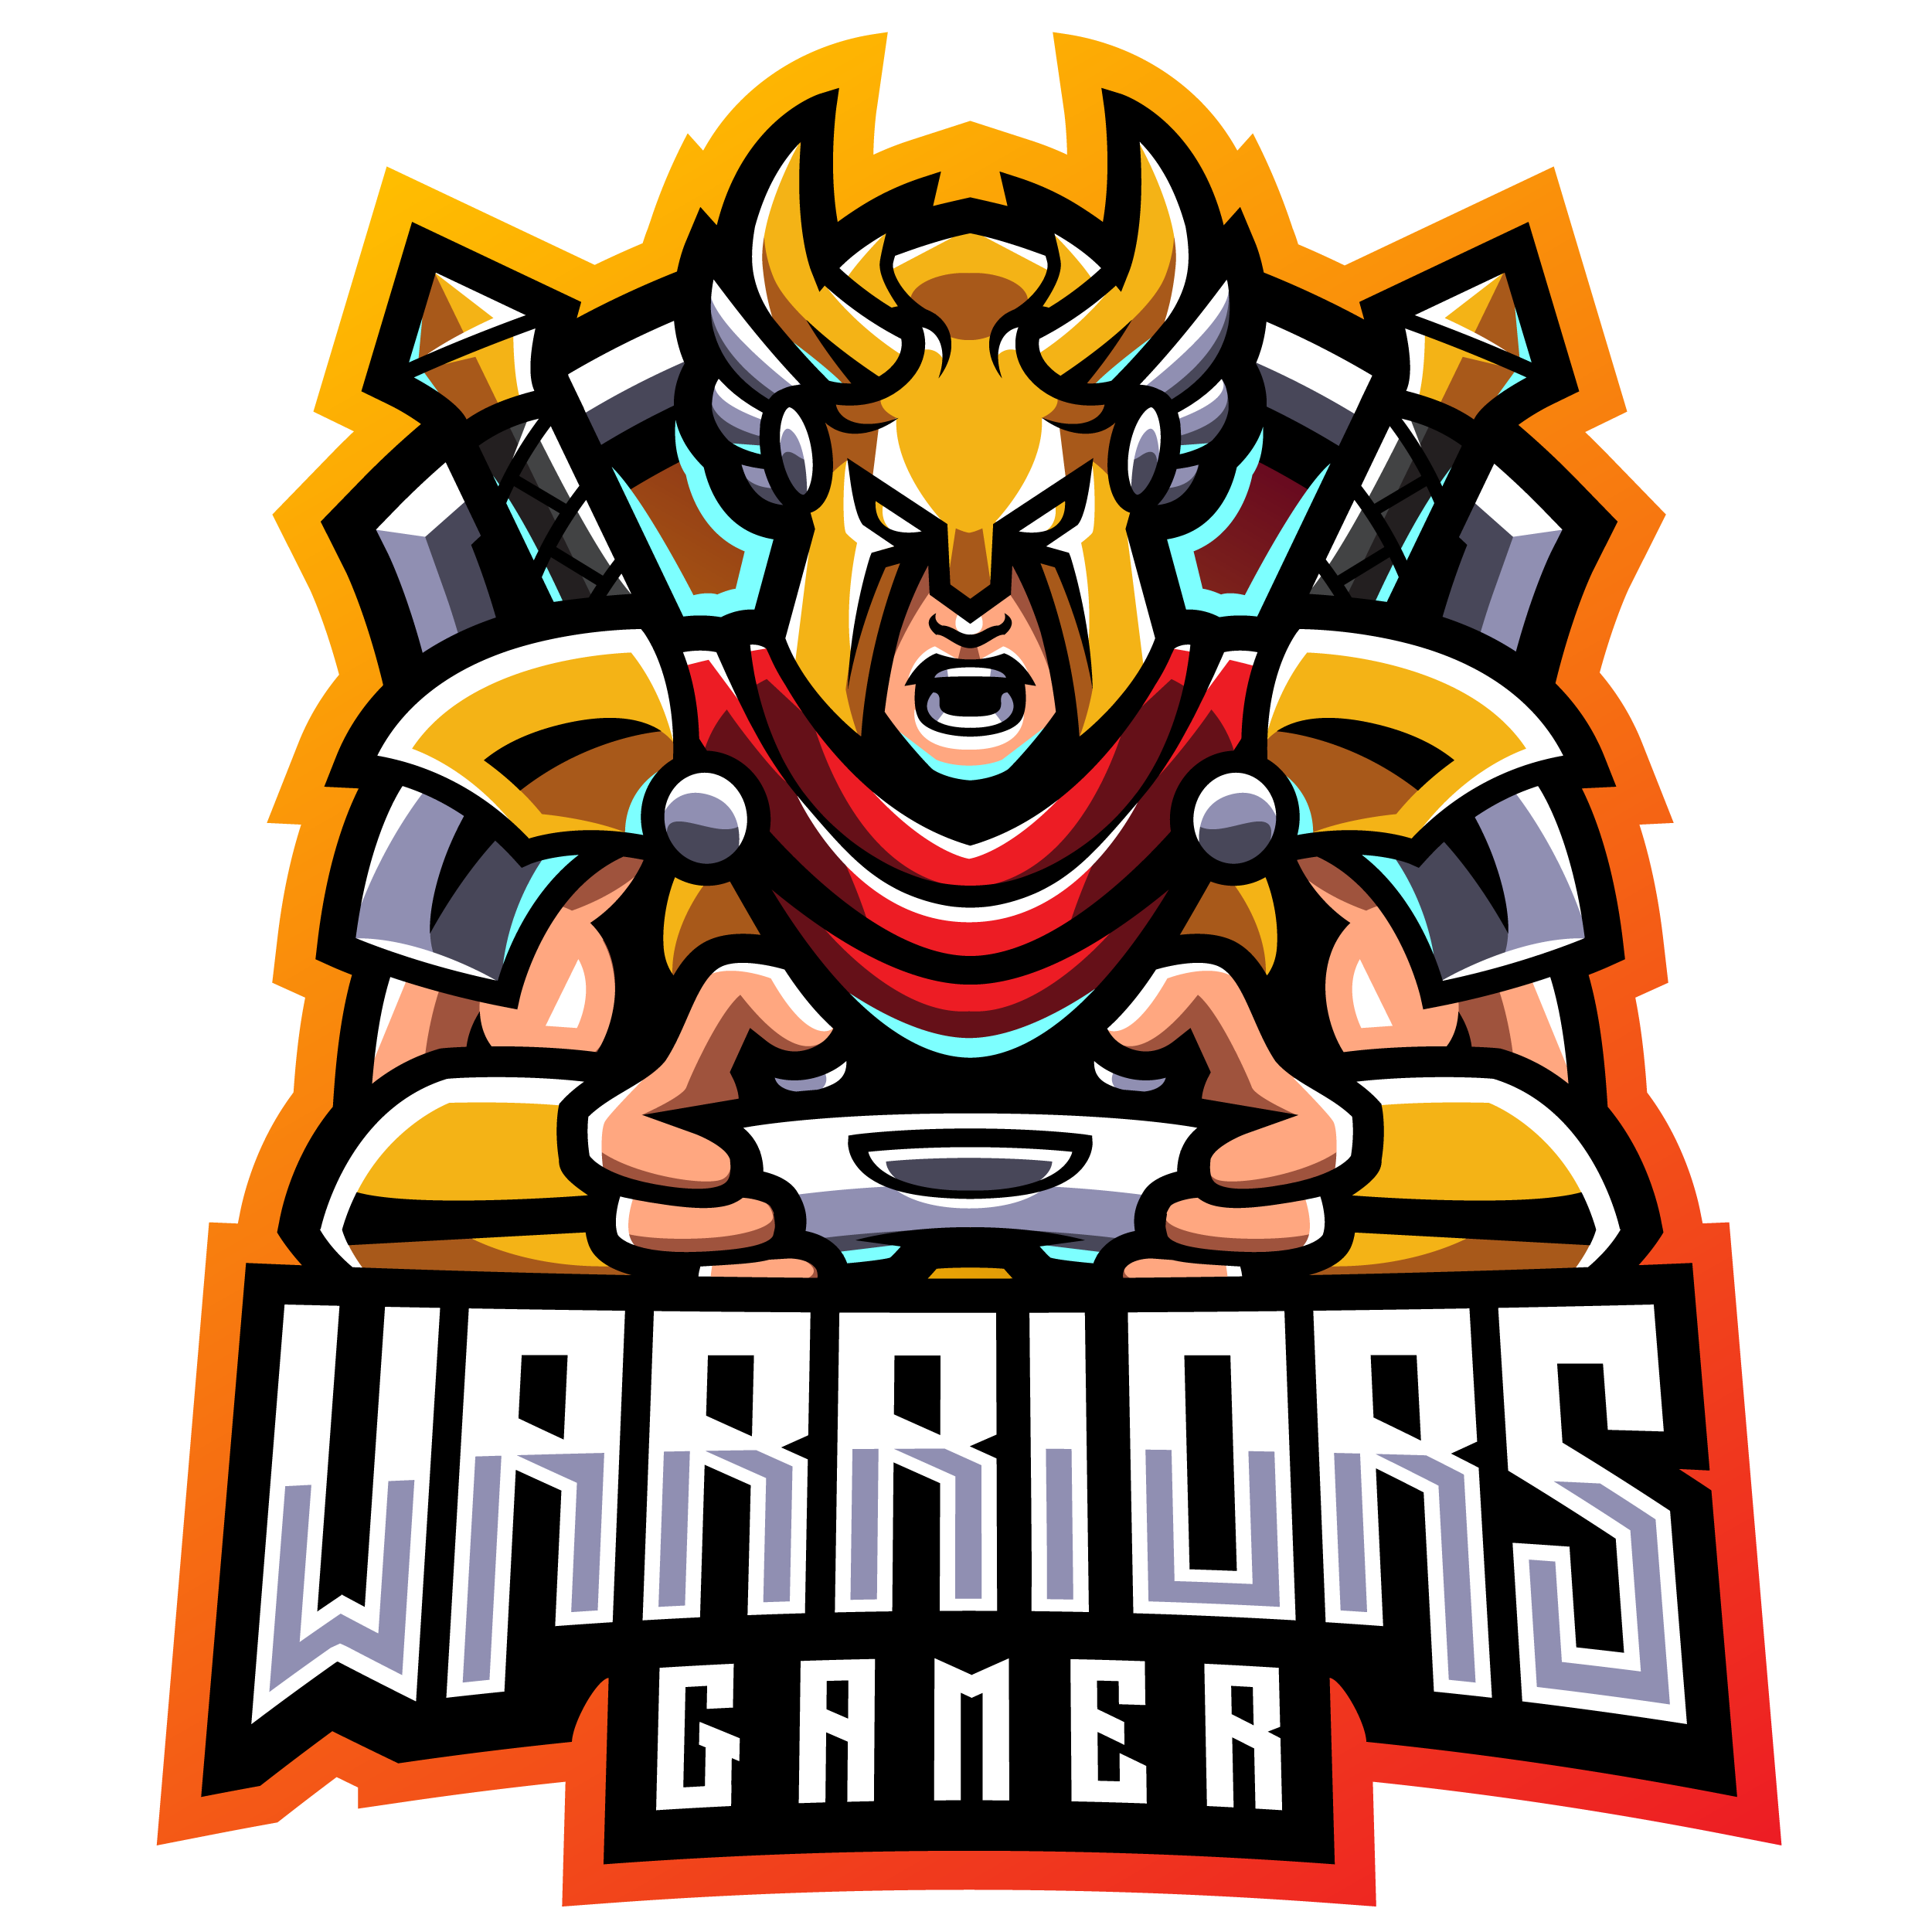 Warriors-Gaming-Clan-Mascot-Logo-PNG-Transparent